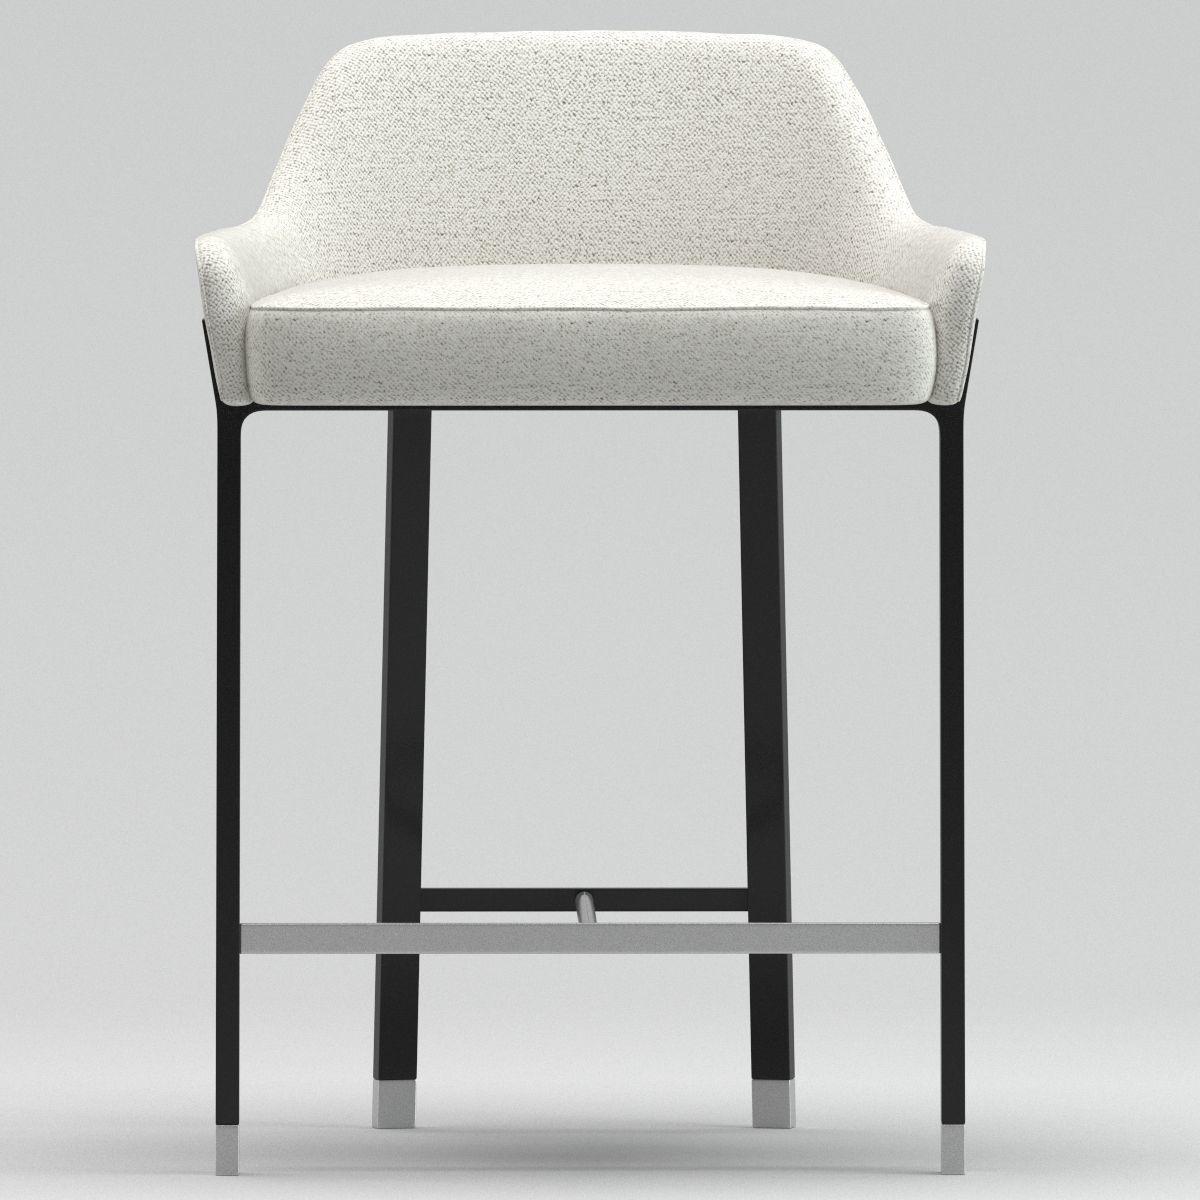 Awesome Blink Counter Stool Sh610 Stellar Work 3D Model Max Obj Machost Co Dining Chair Design Ideas Machostcouk